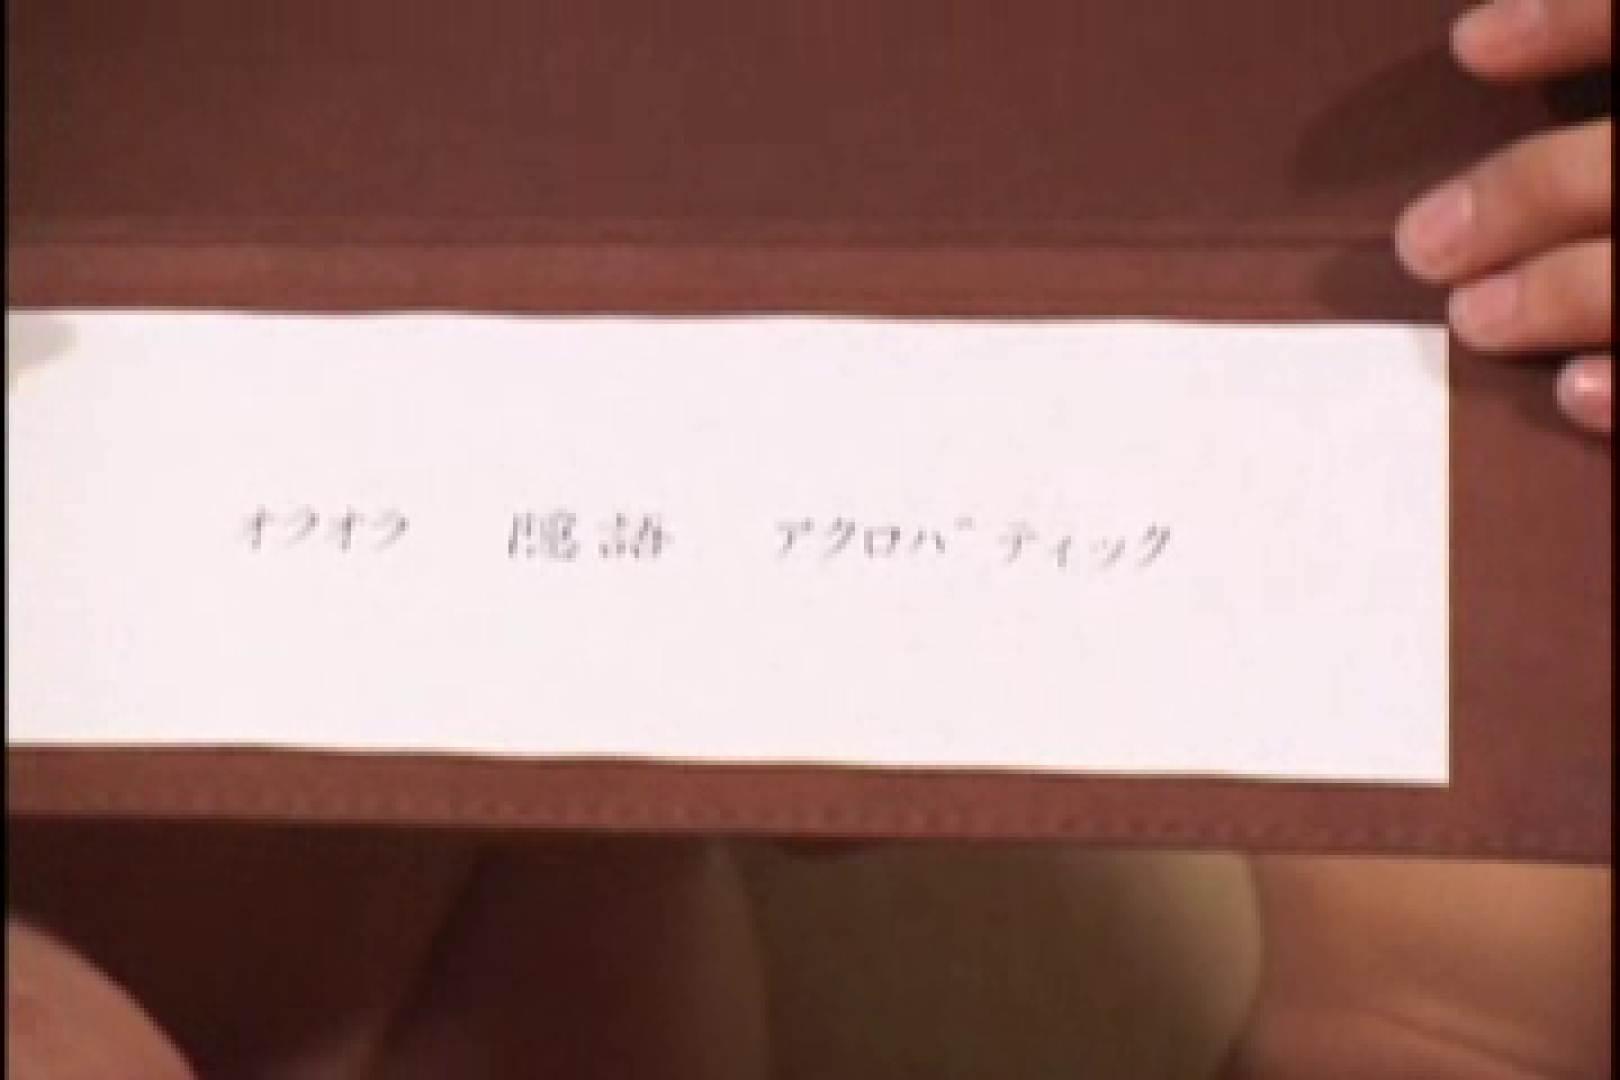 BEST OF イケメン!!男目線のガチSEX vol.04(対女性作品) 対女性 ゲイアダルトビデオ画像 92枚 55